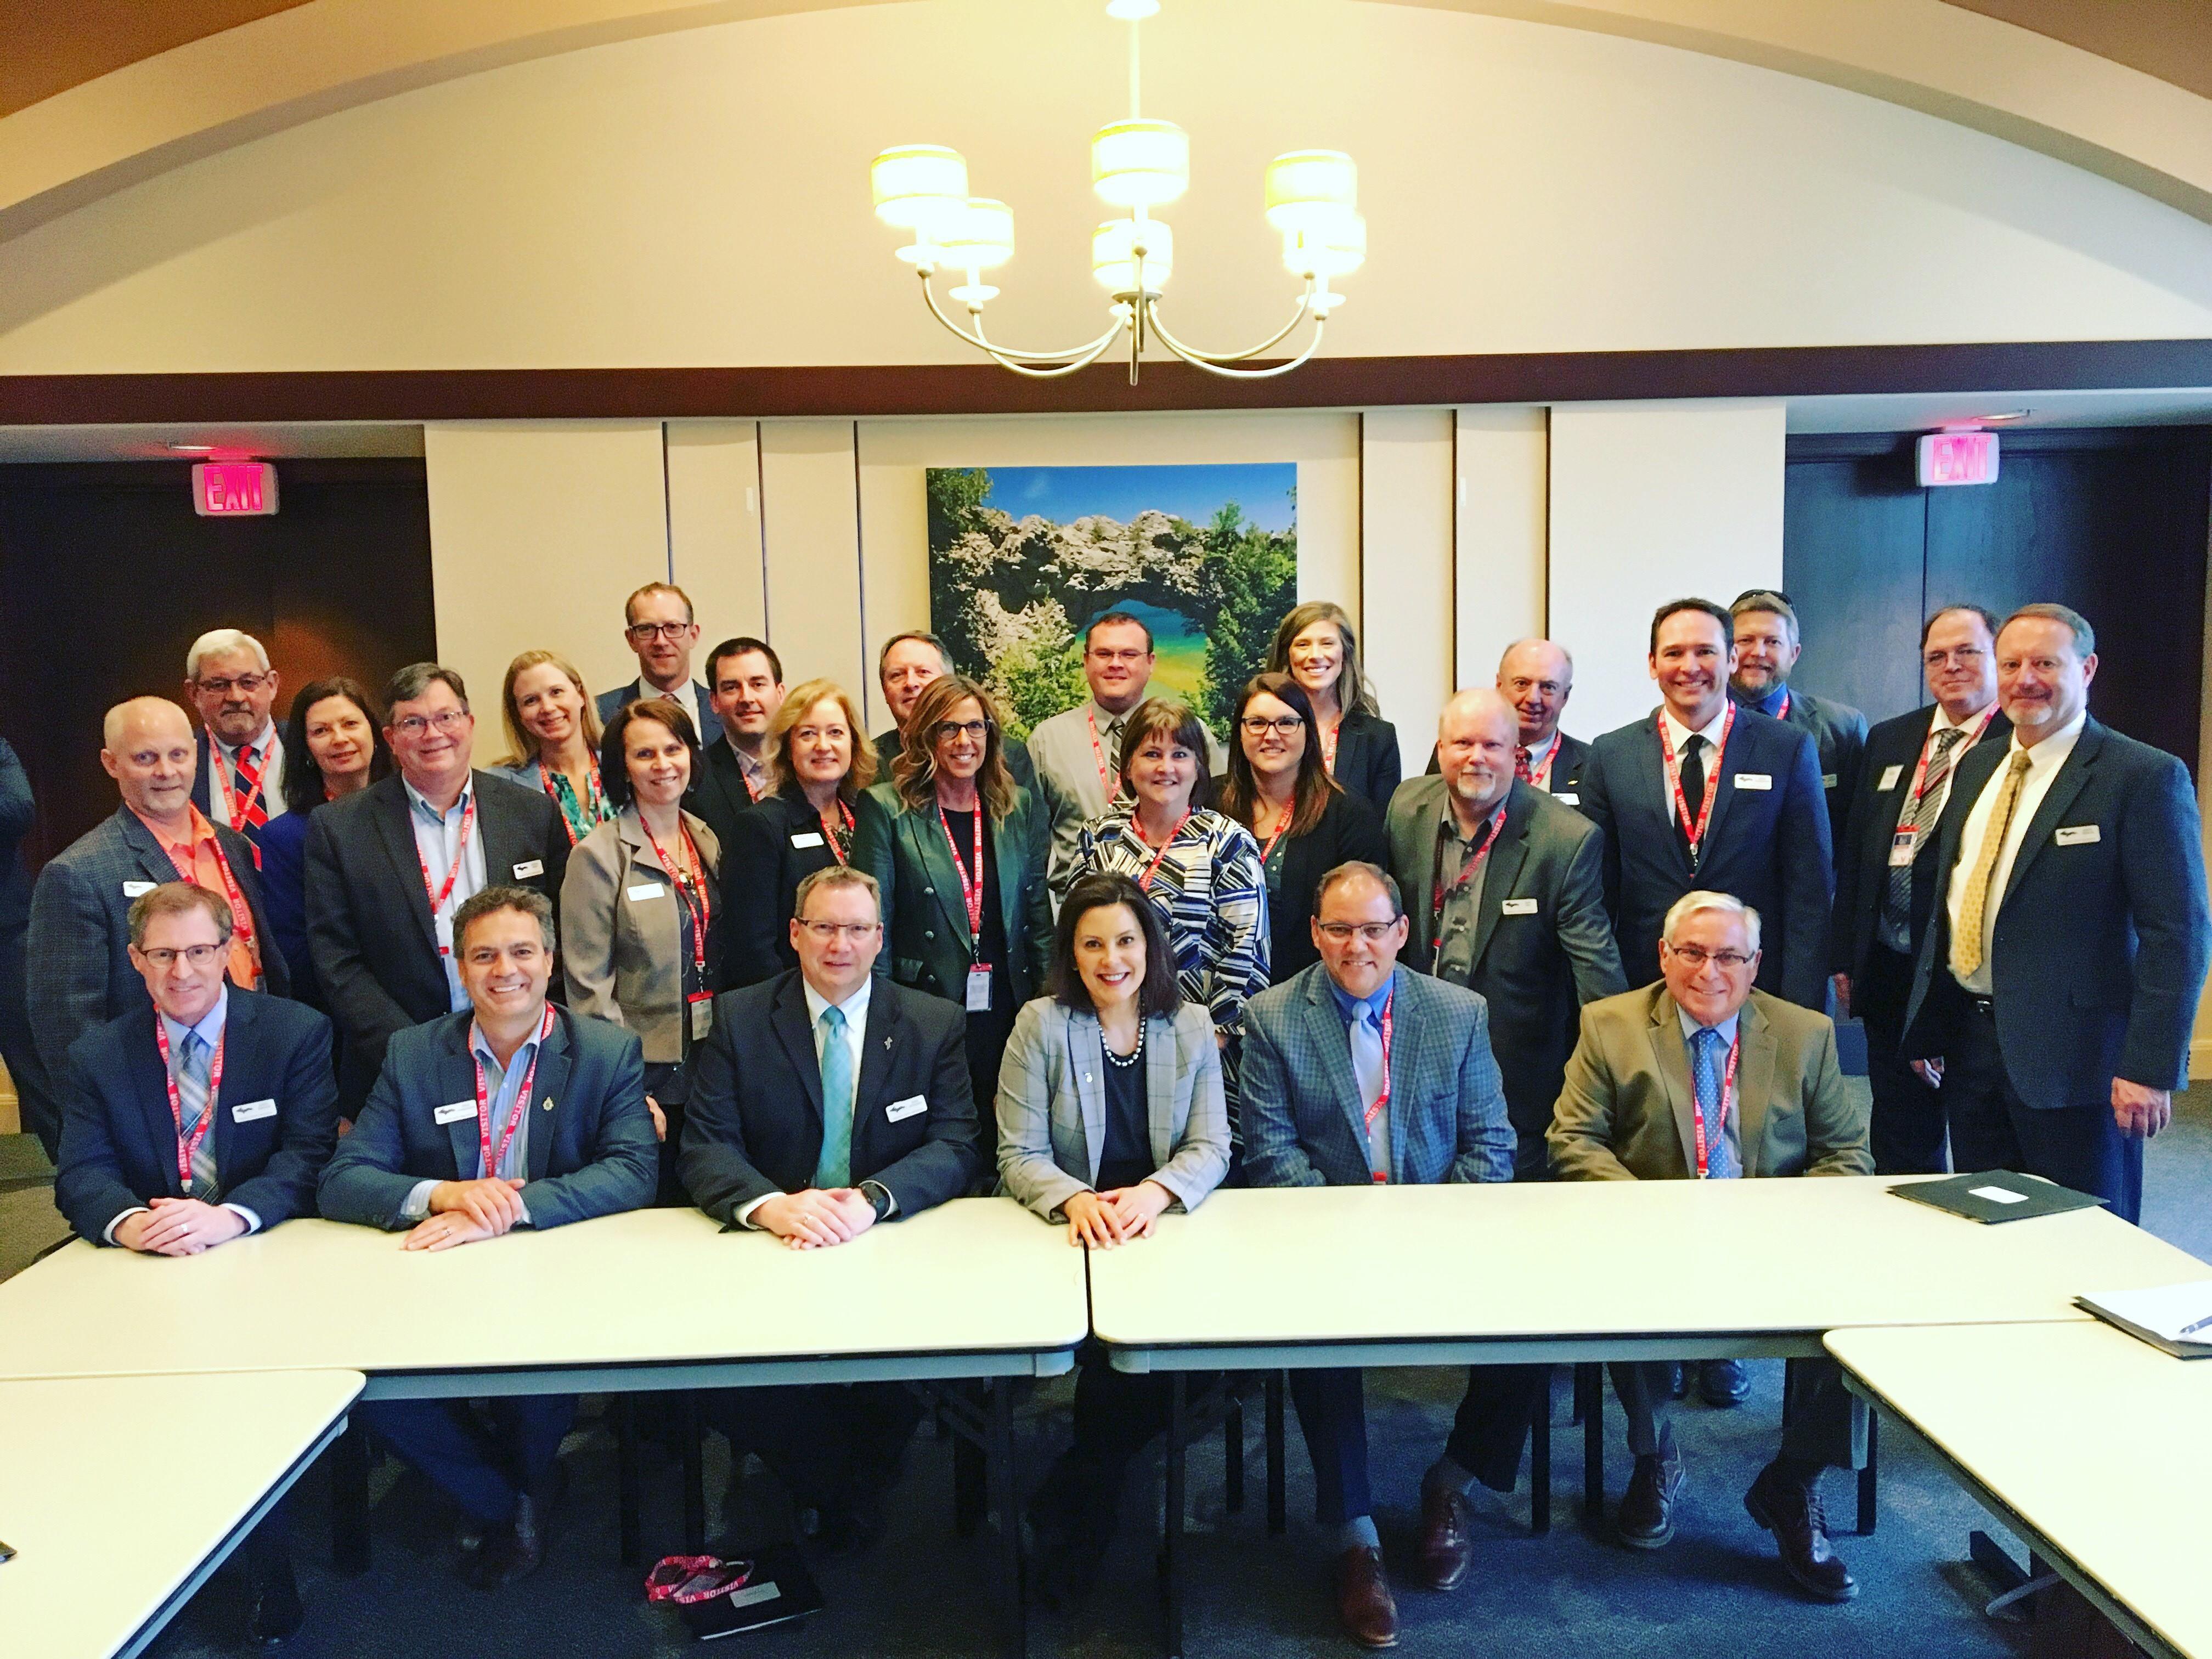 Ambassadors with Governor whitmer